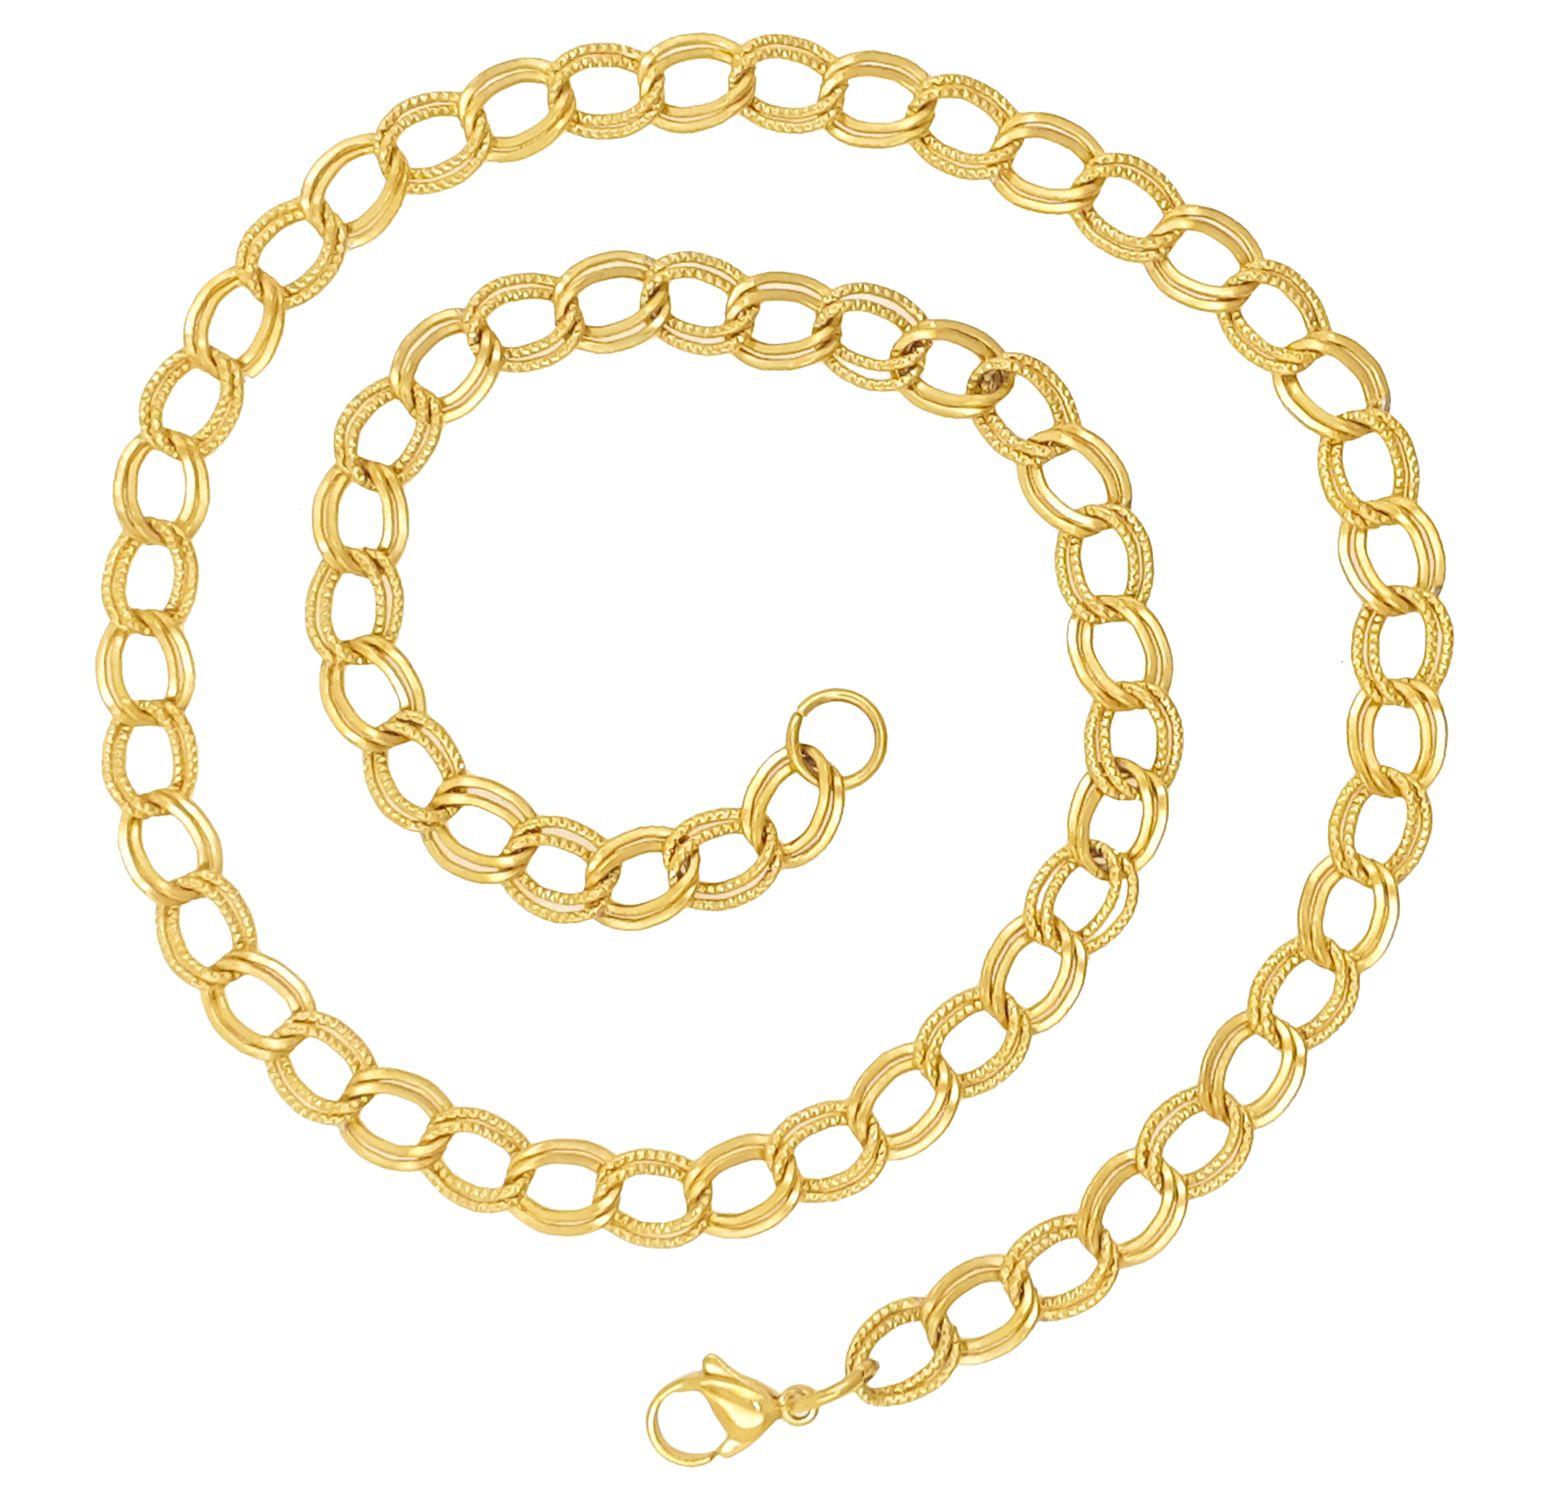 Saizen CH233 Designer Gold Tone Chain For Men, Boyfriend & Husband